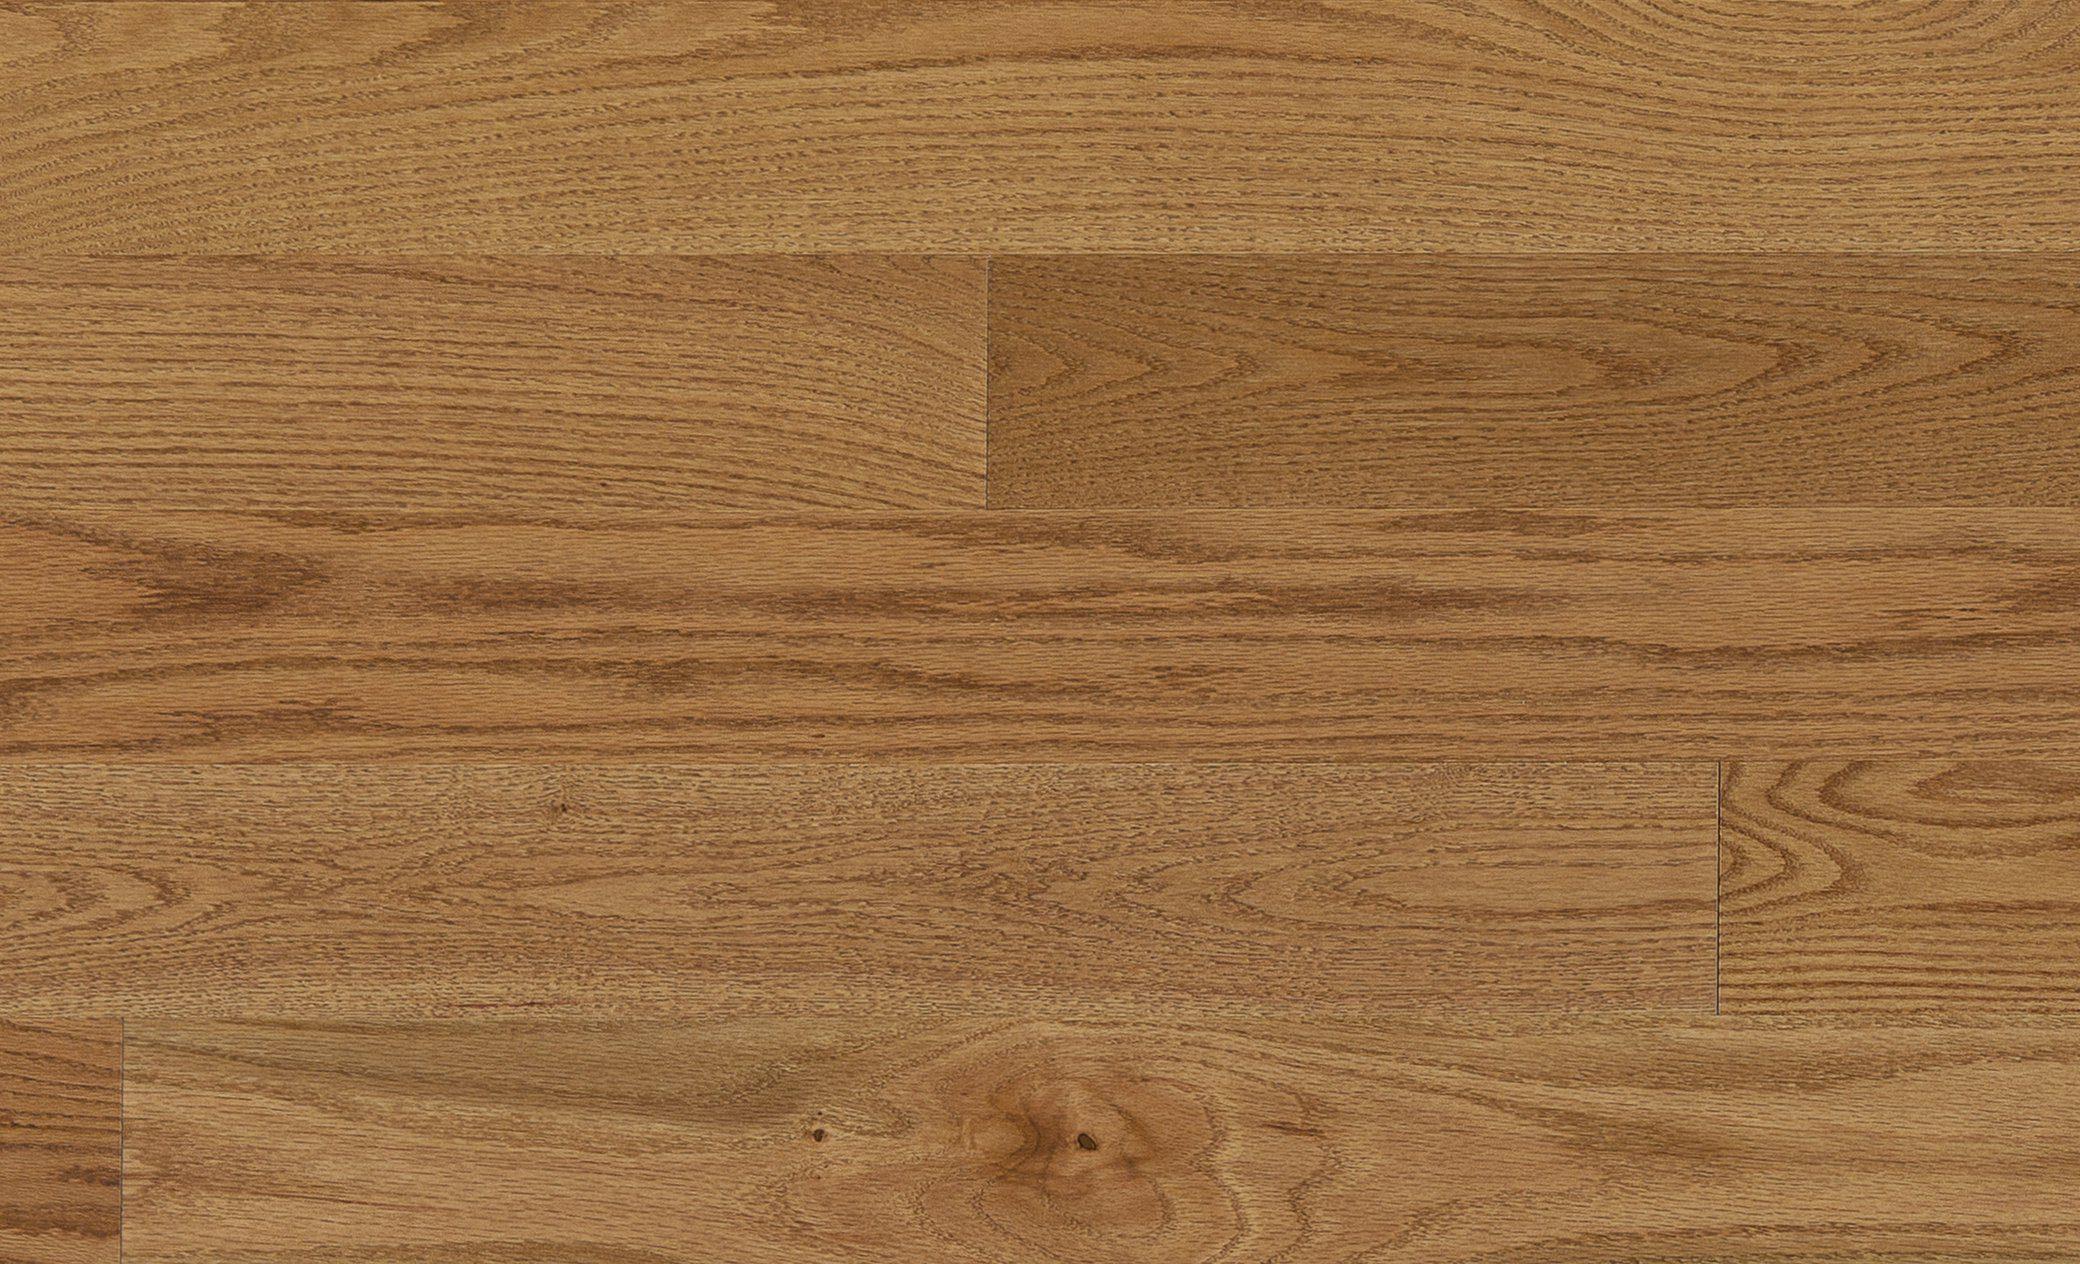 Mercier Toast Brown Red Oak Solid Width: 2 1/4